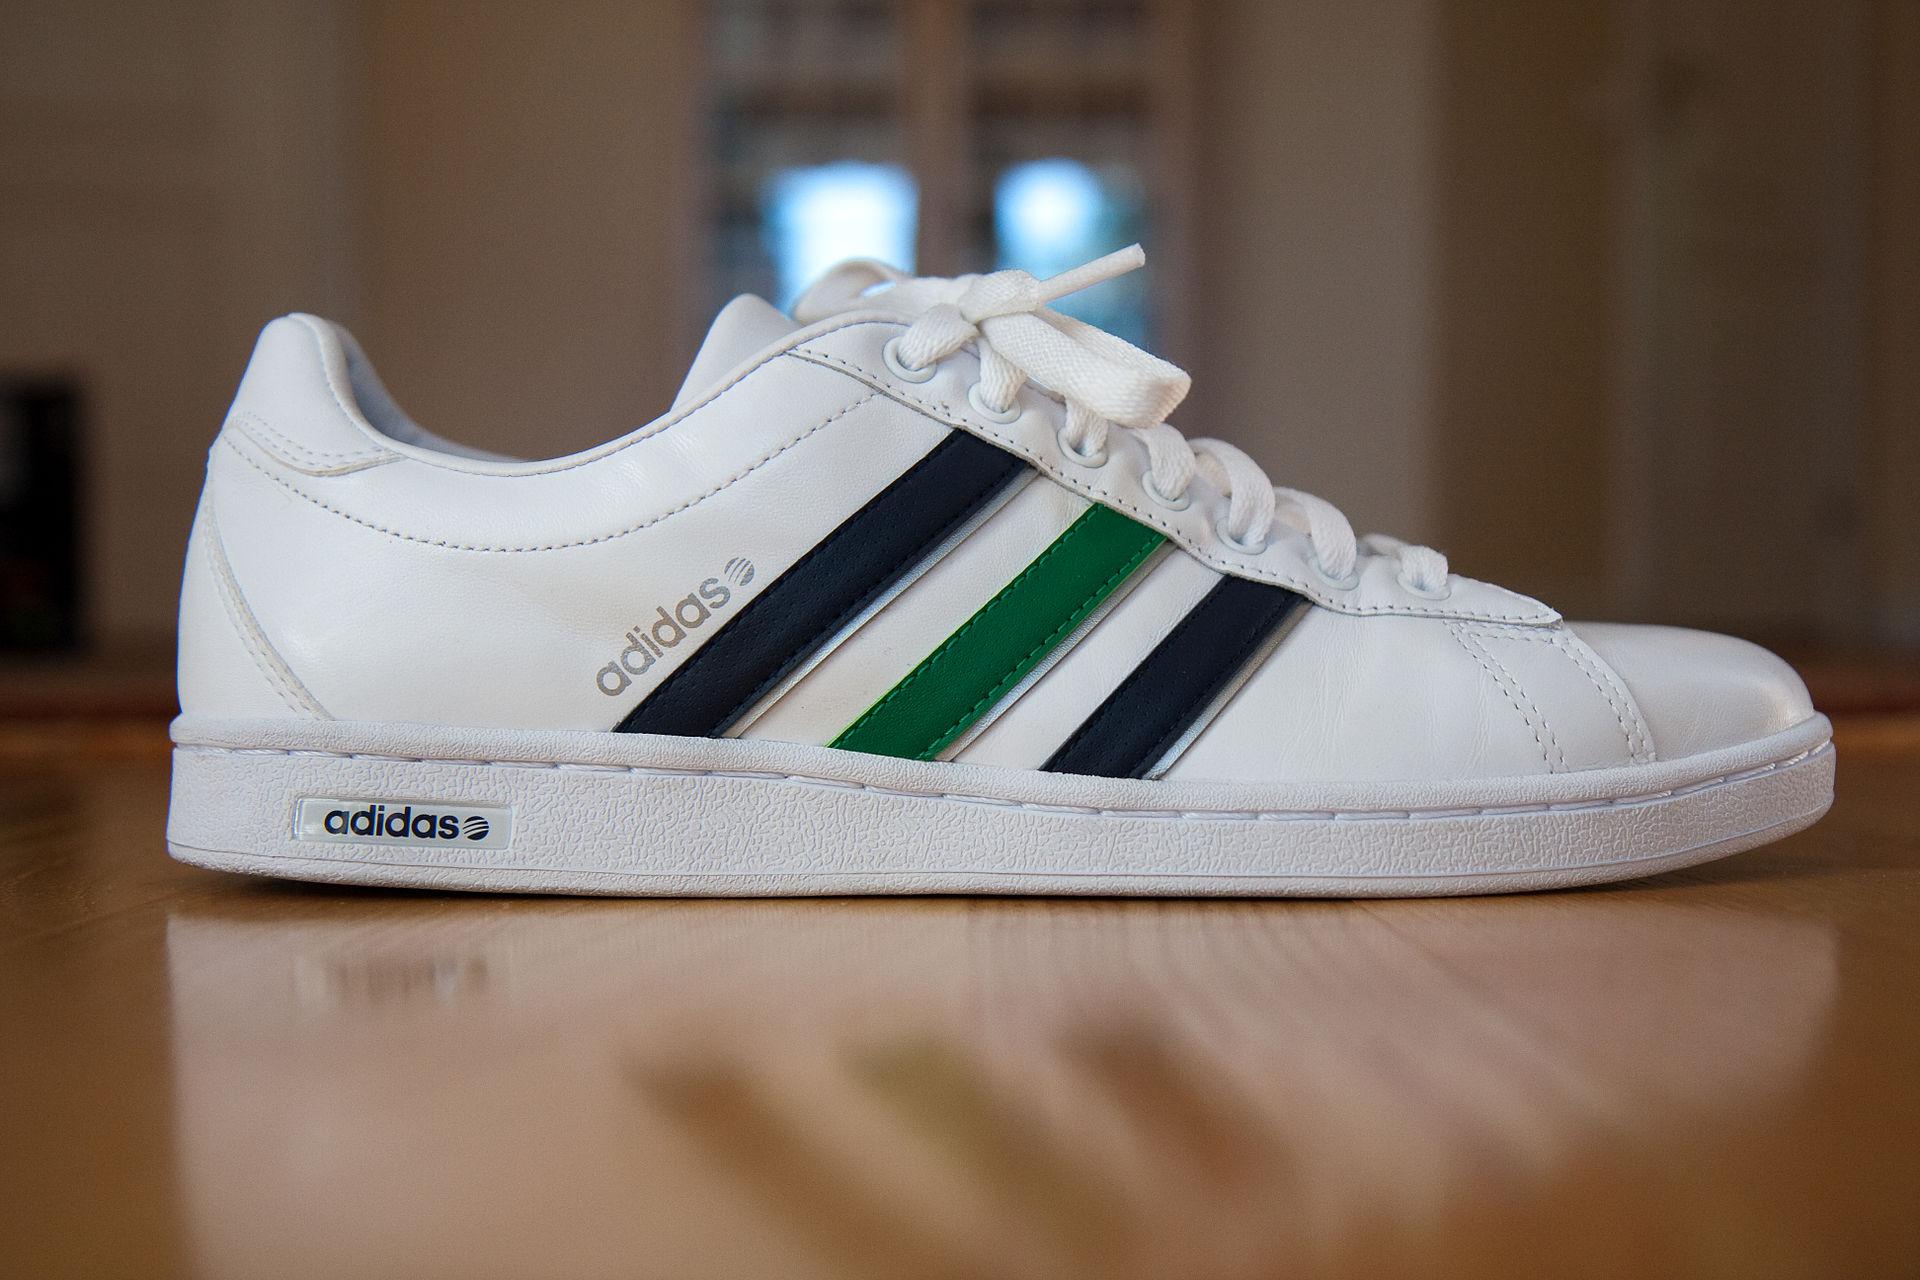 1920px-An_Adidas_shoe.jpg